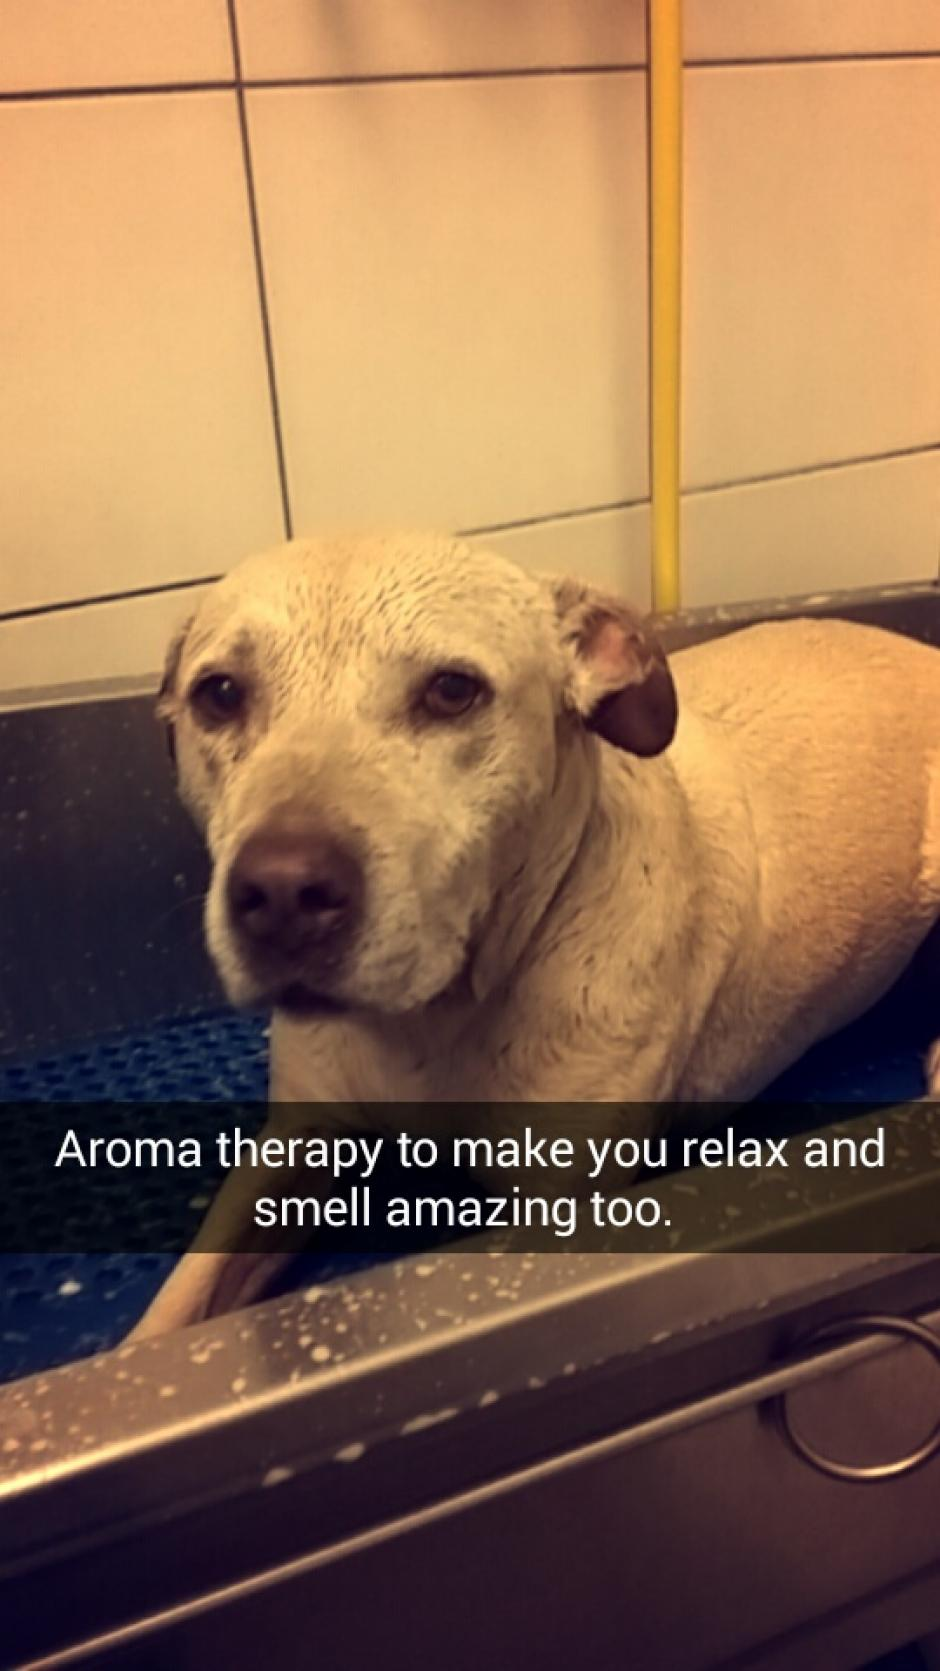 hannah recibió un poco de aroma terapia. (Foto: Snapchat)